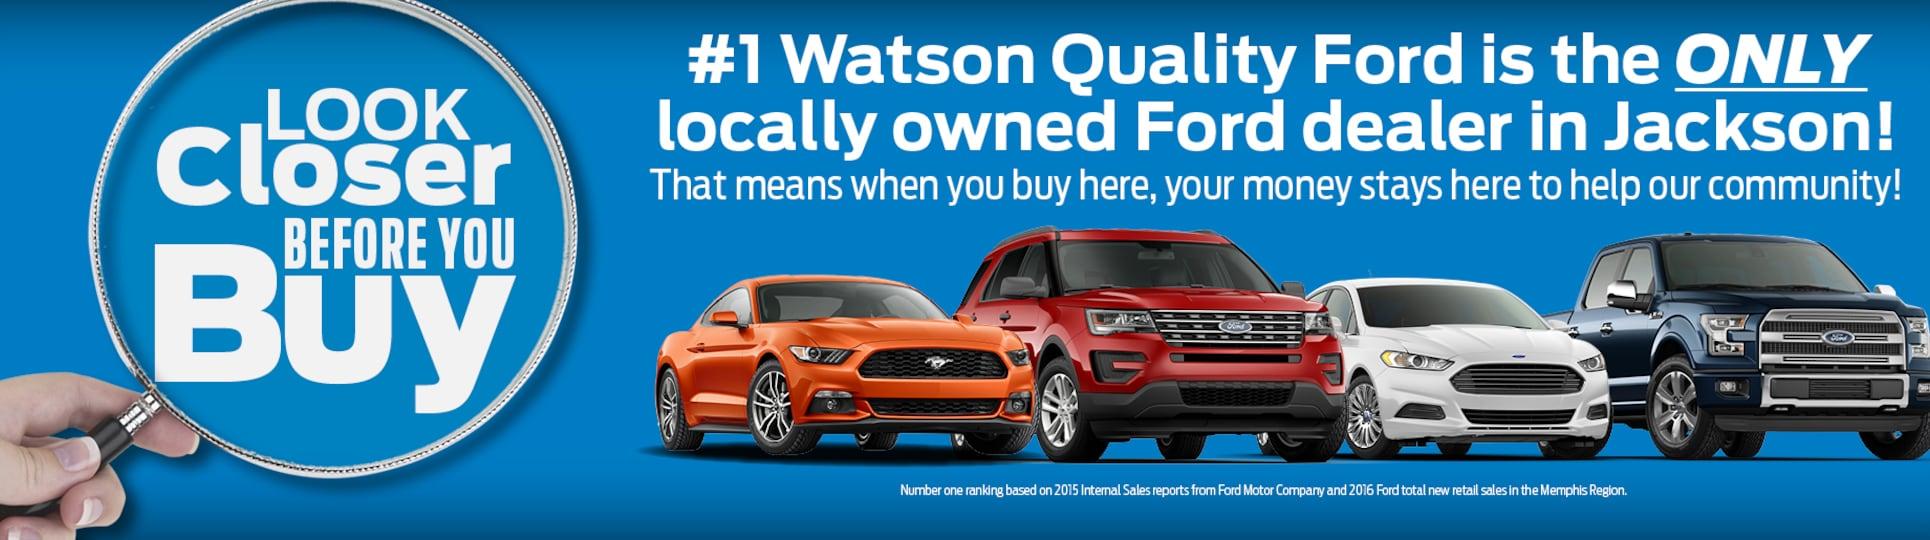 Jackson watson quality ford inc new used ford cars ridgeland ms i solutioingenieria Choice Image